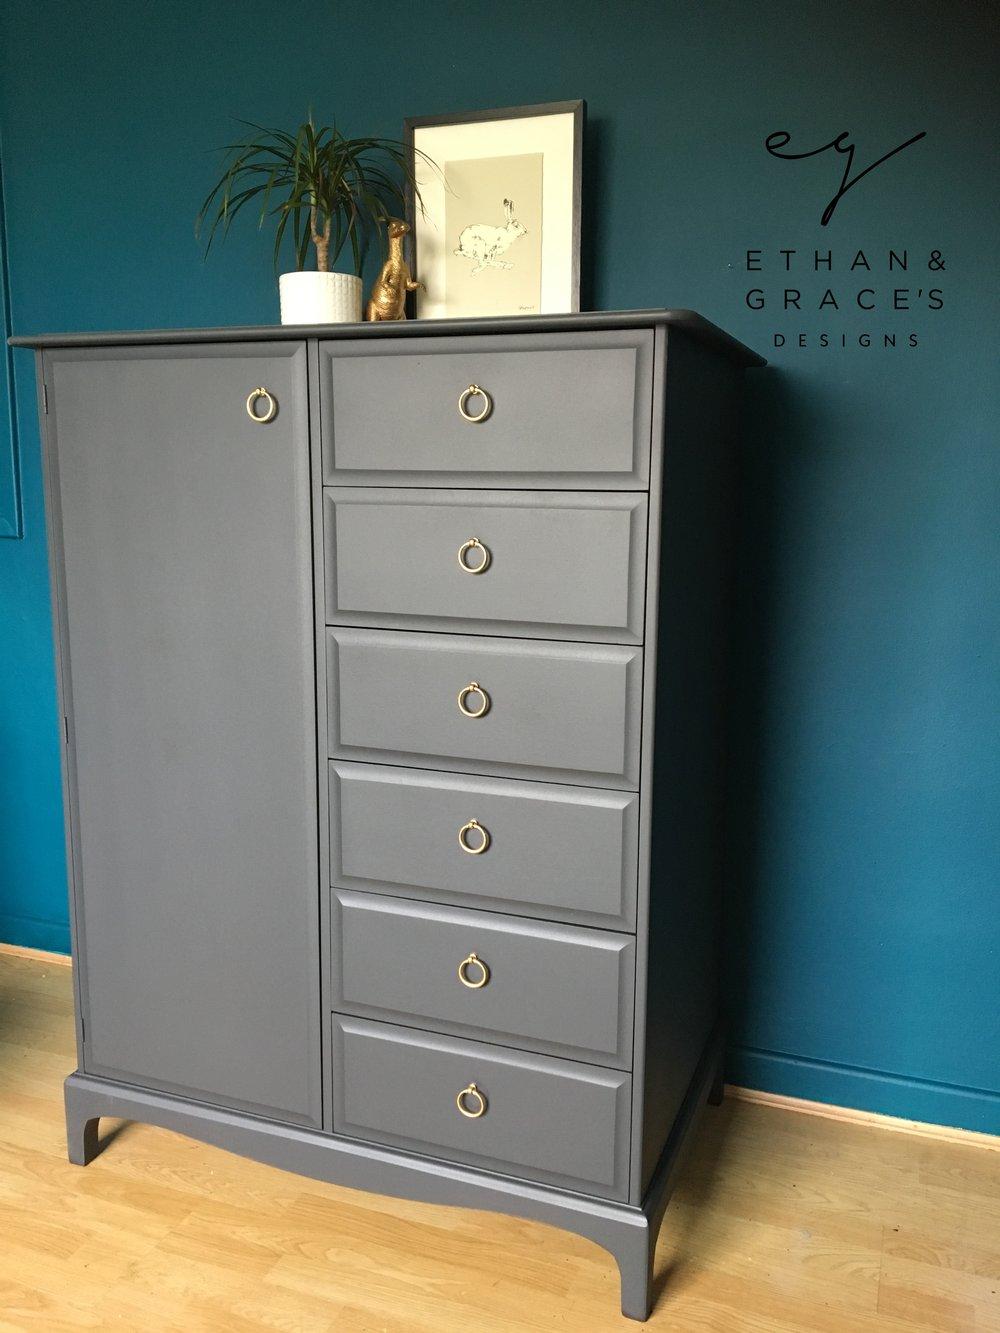 Image of Dark grey linen/mini wardrobe by stag.